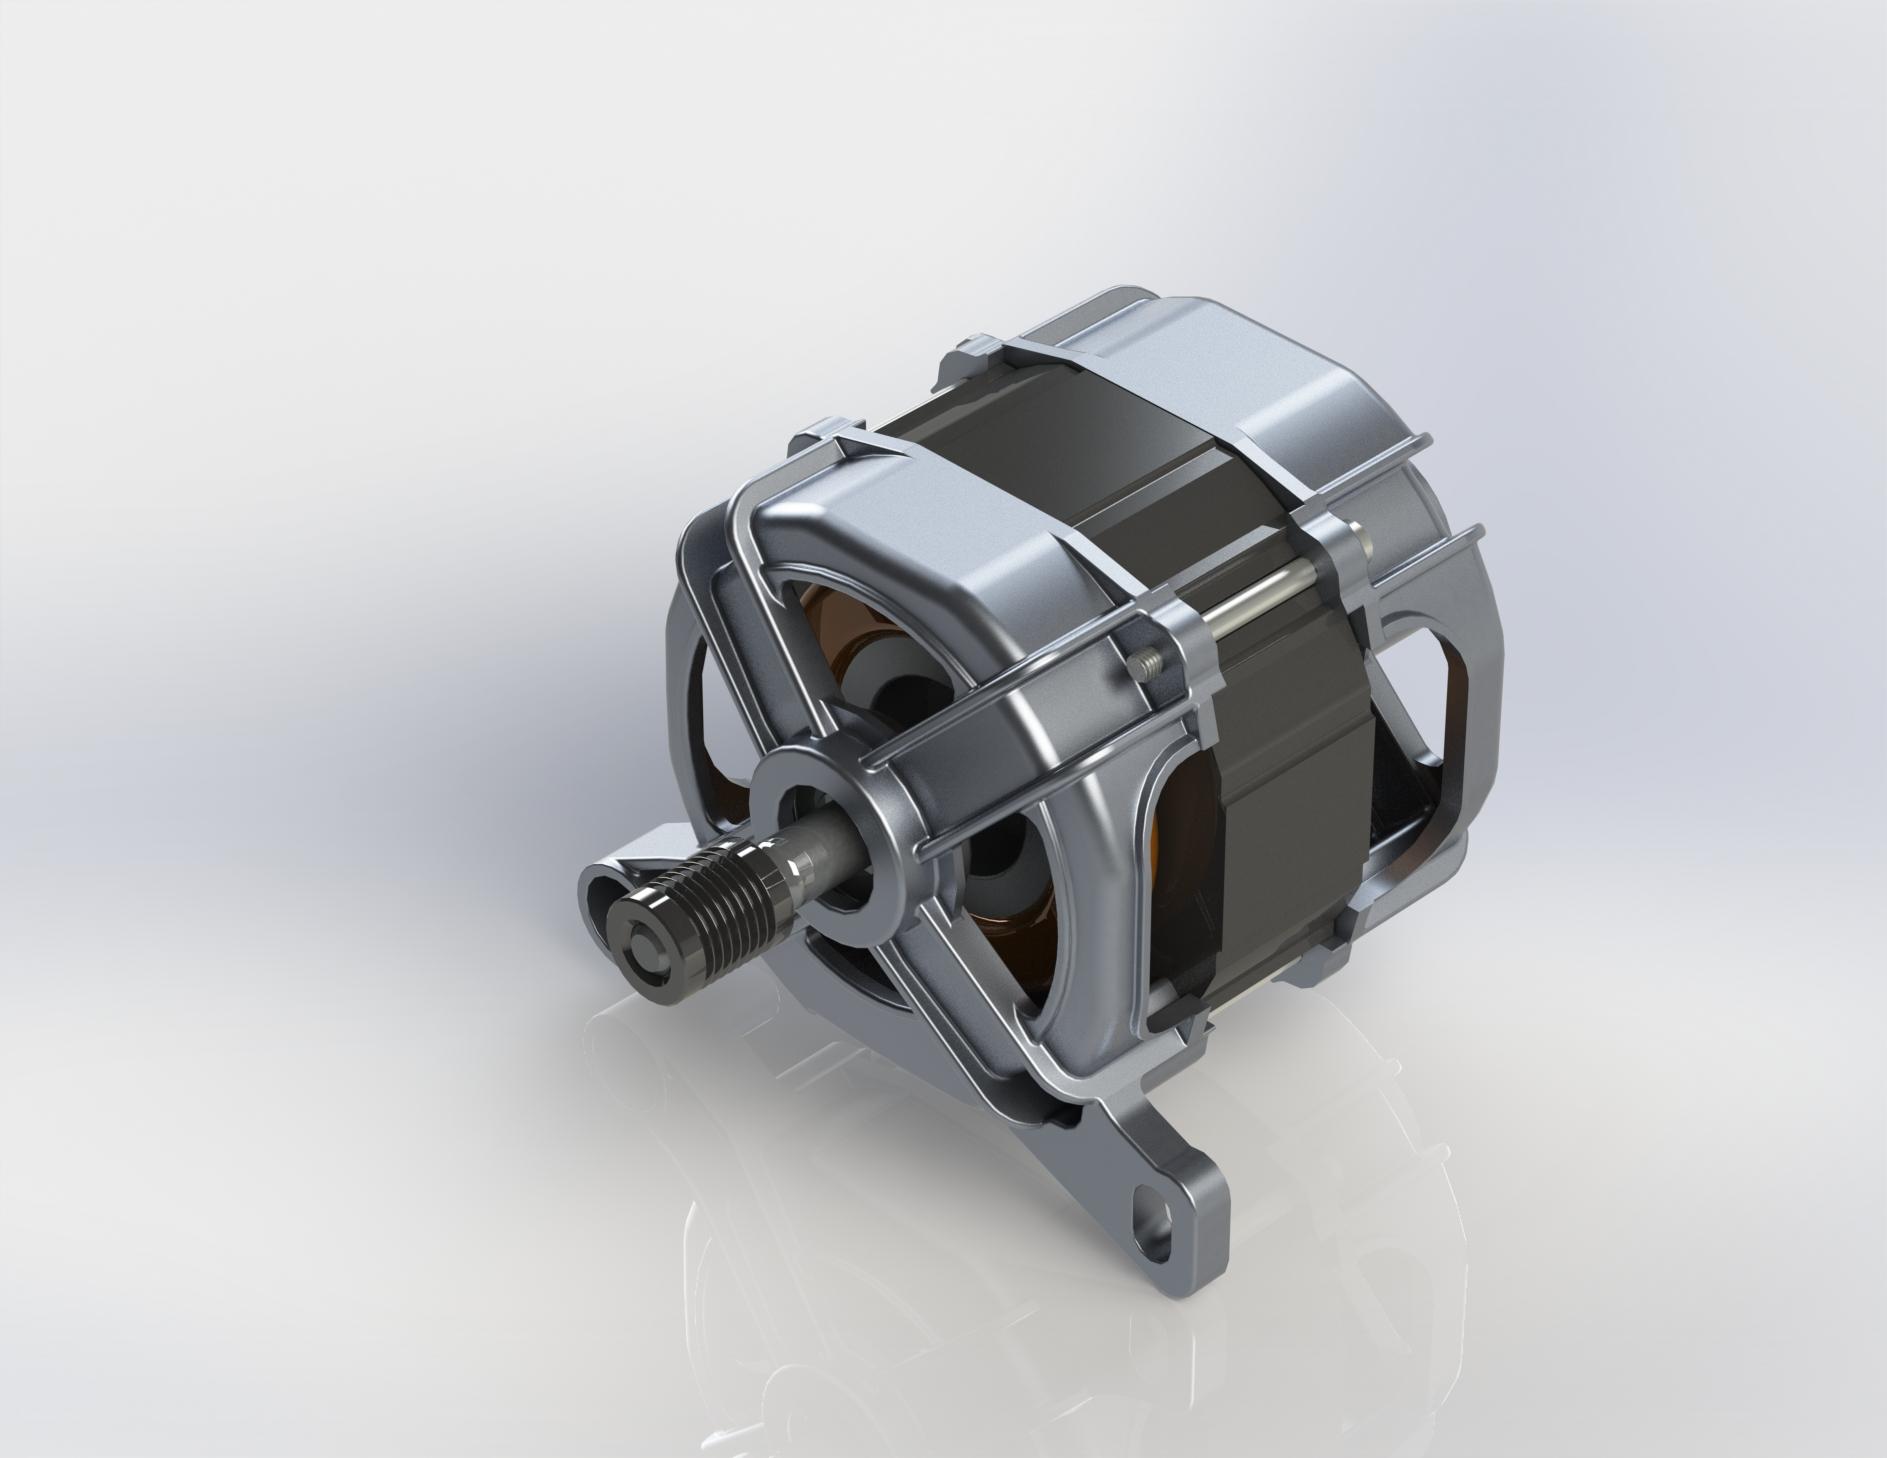 Washing machine motor_3 Phase CIM motor